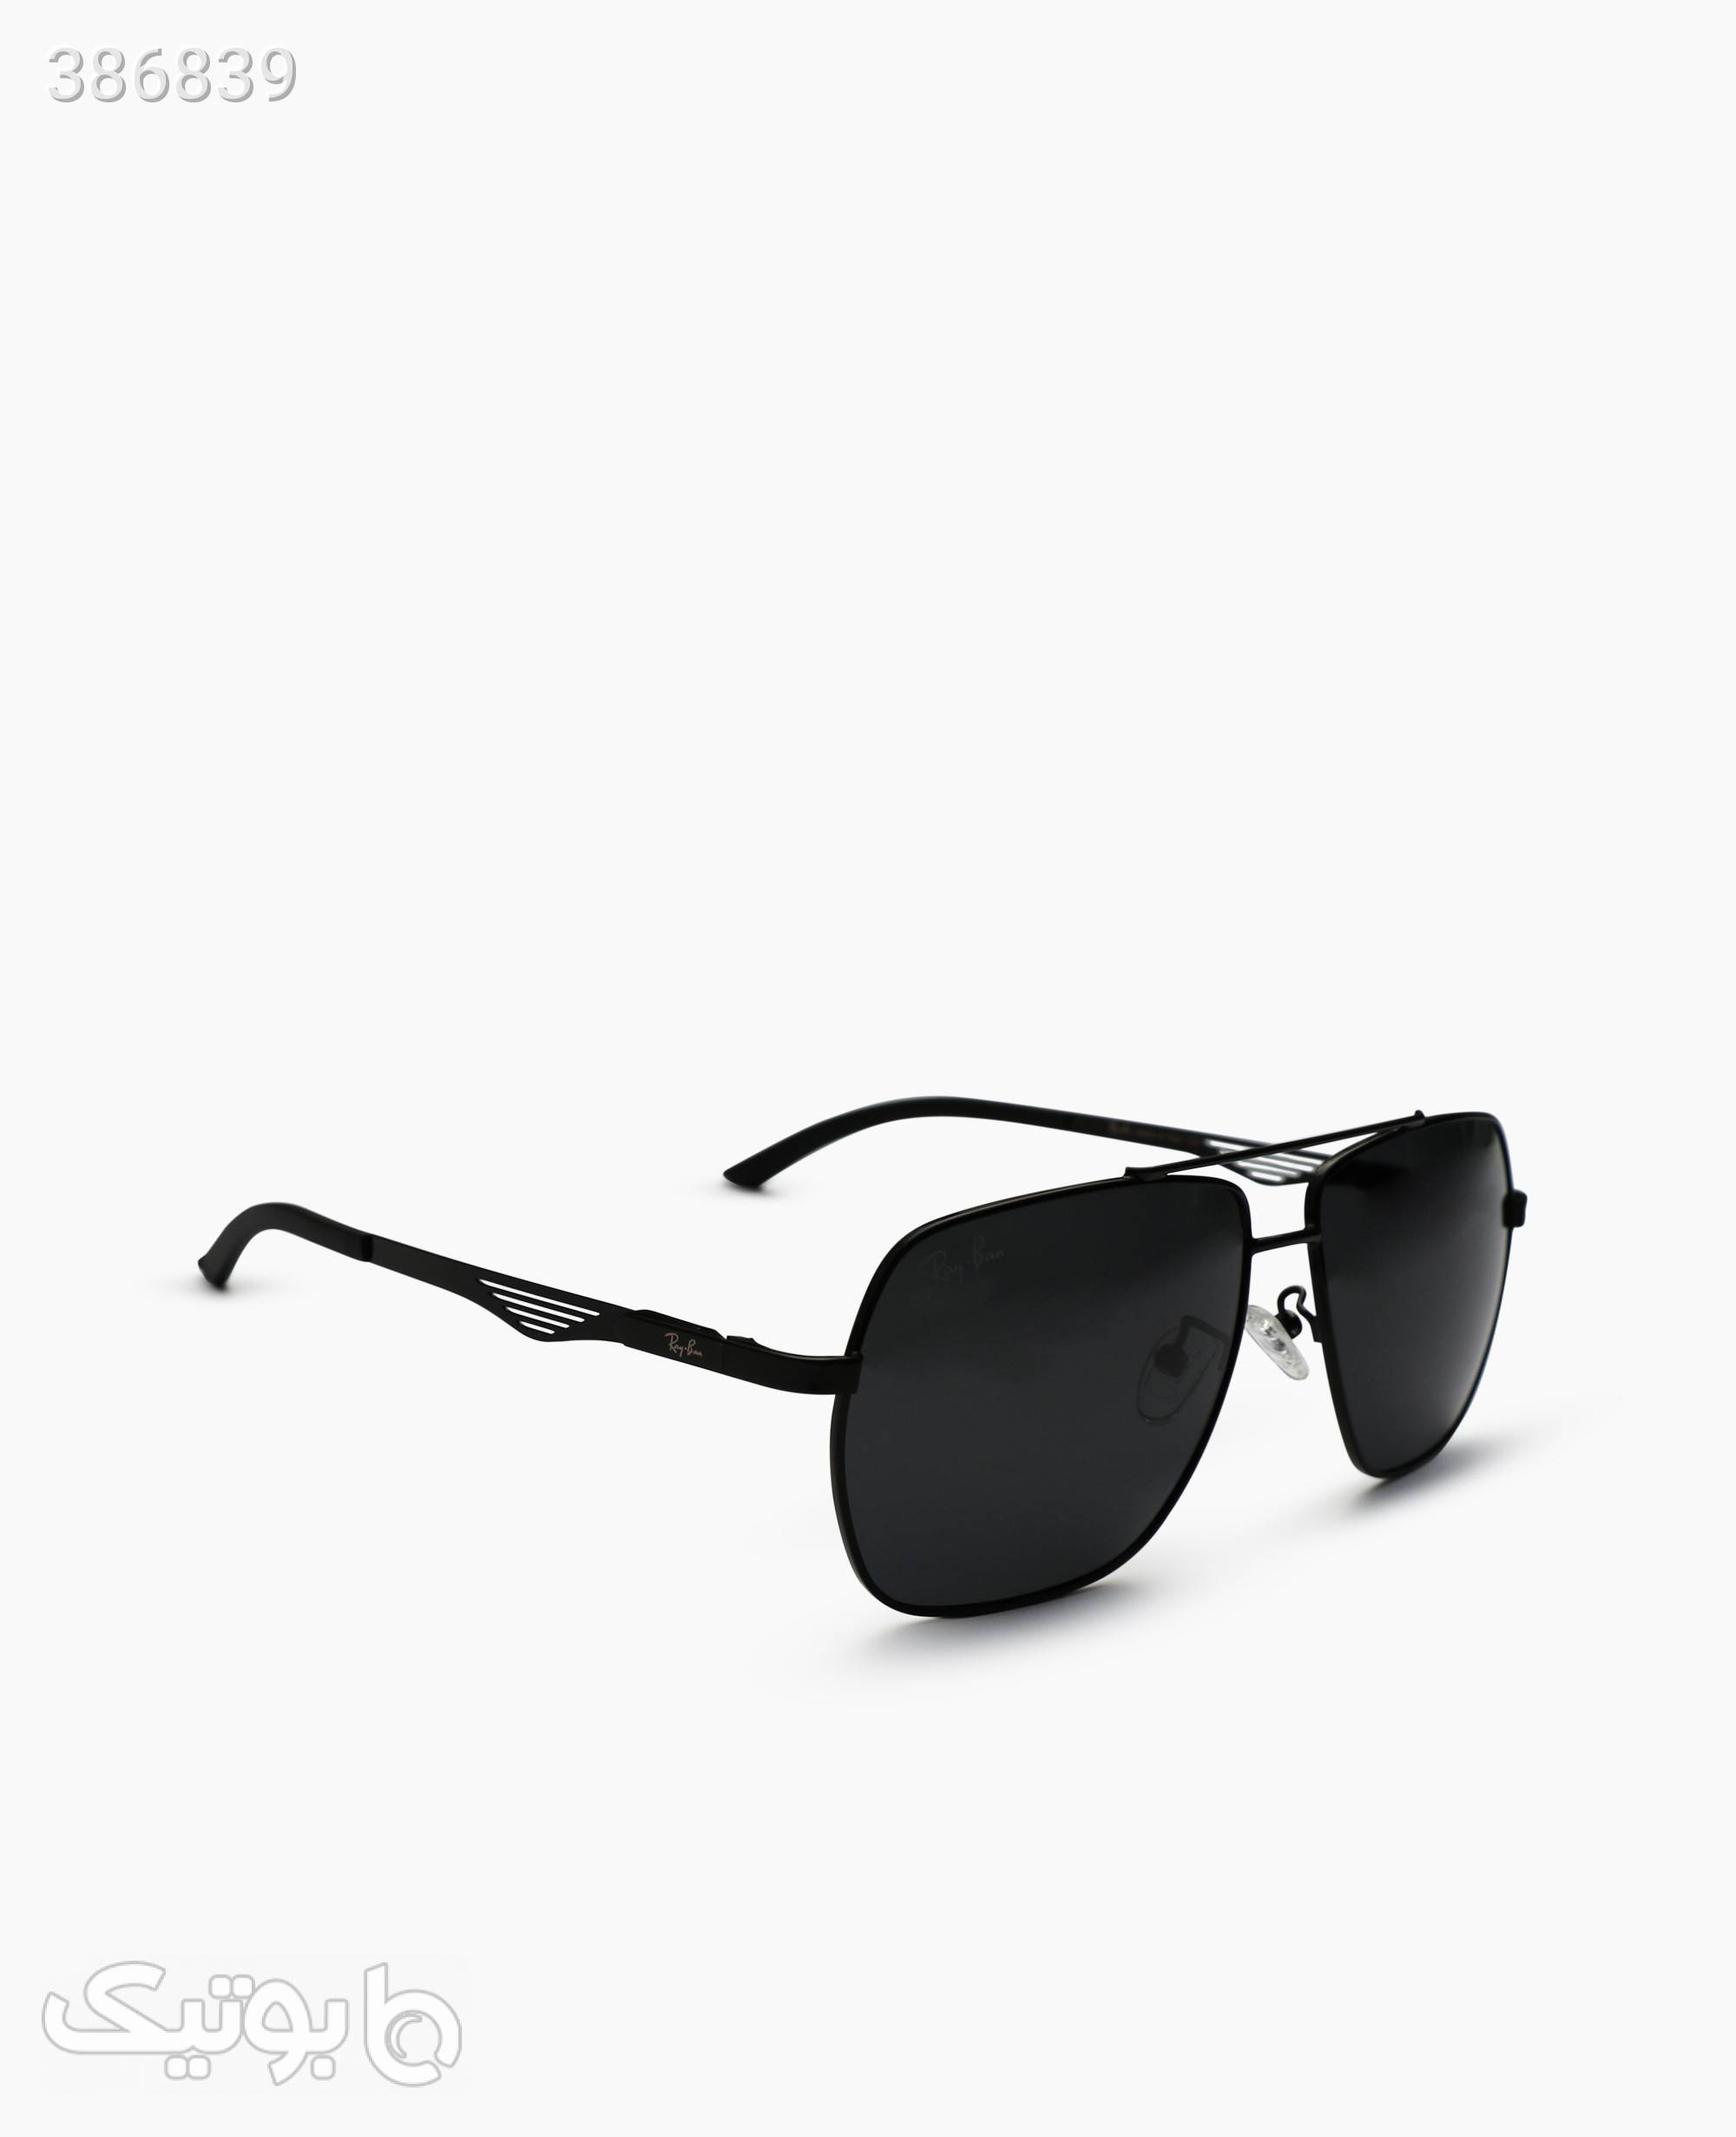 عینک آفتابی Ray.Ban کد 3239 مشکی عینک آفتابی